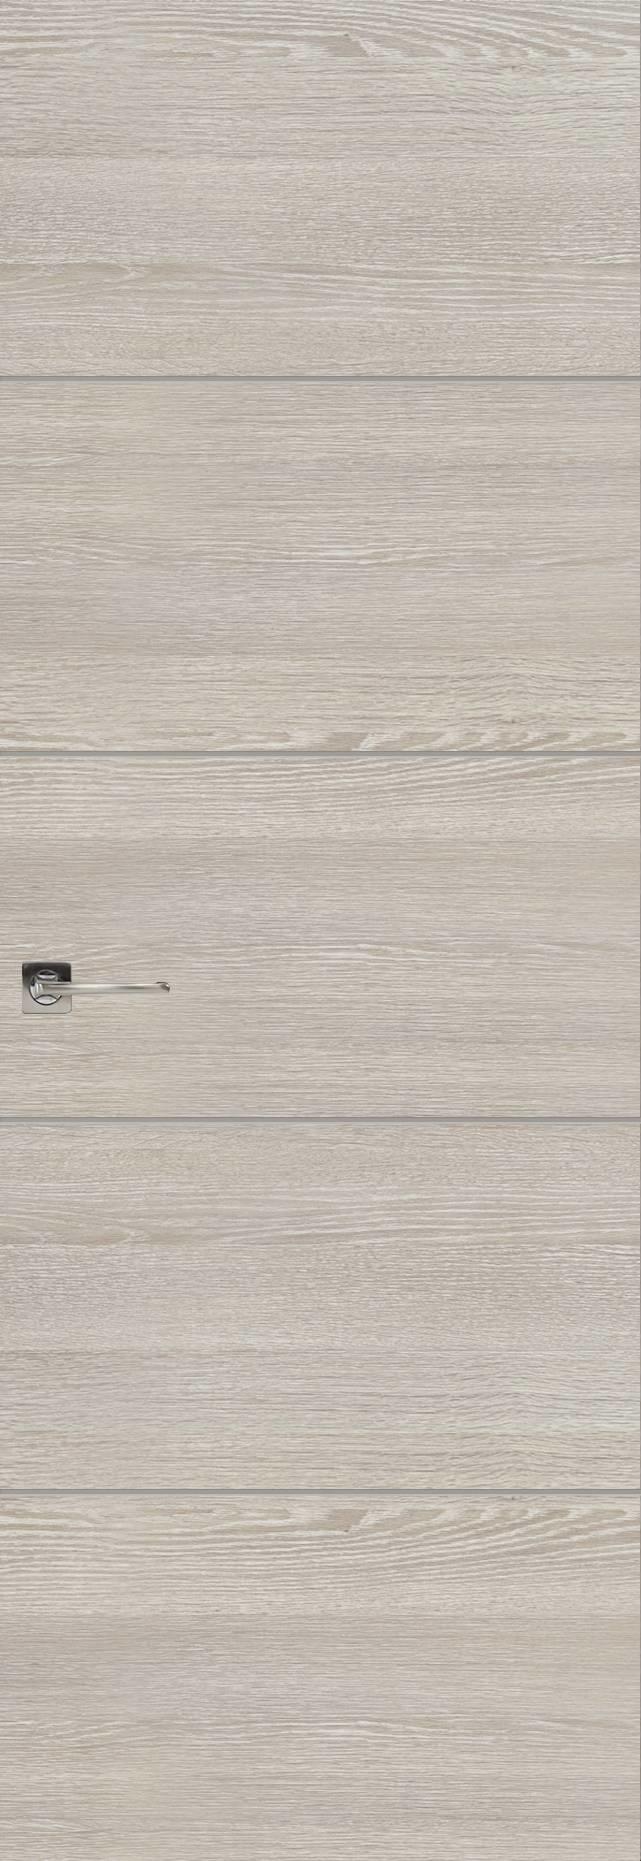 Tivoli Д-2 Invisible цвет - Серый дуб Без стекла (ДГ)